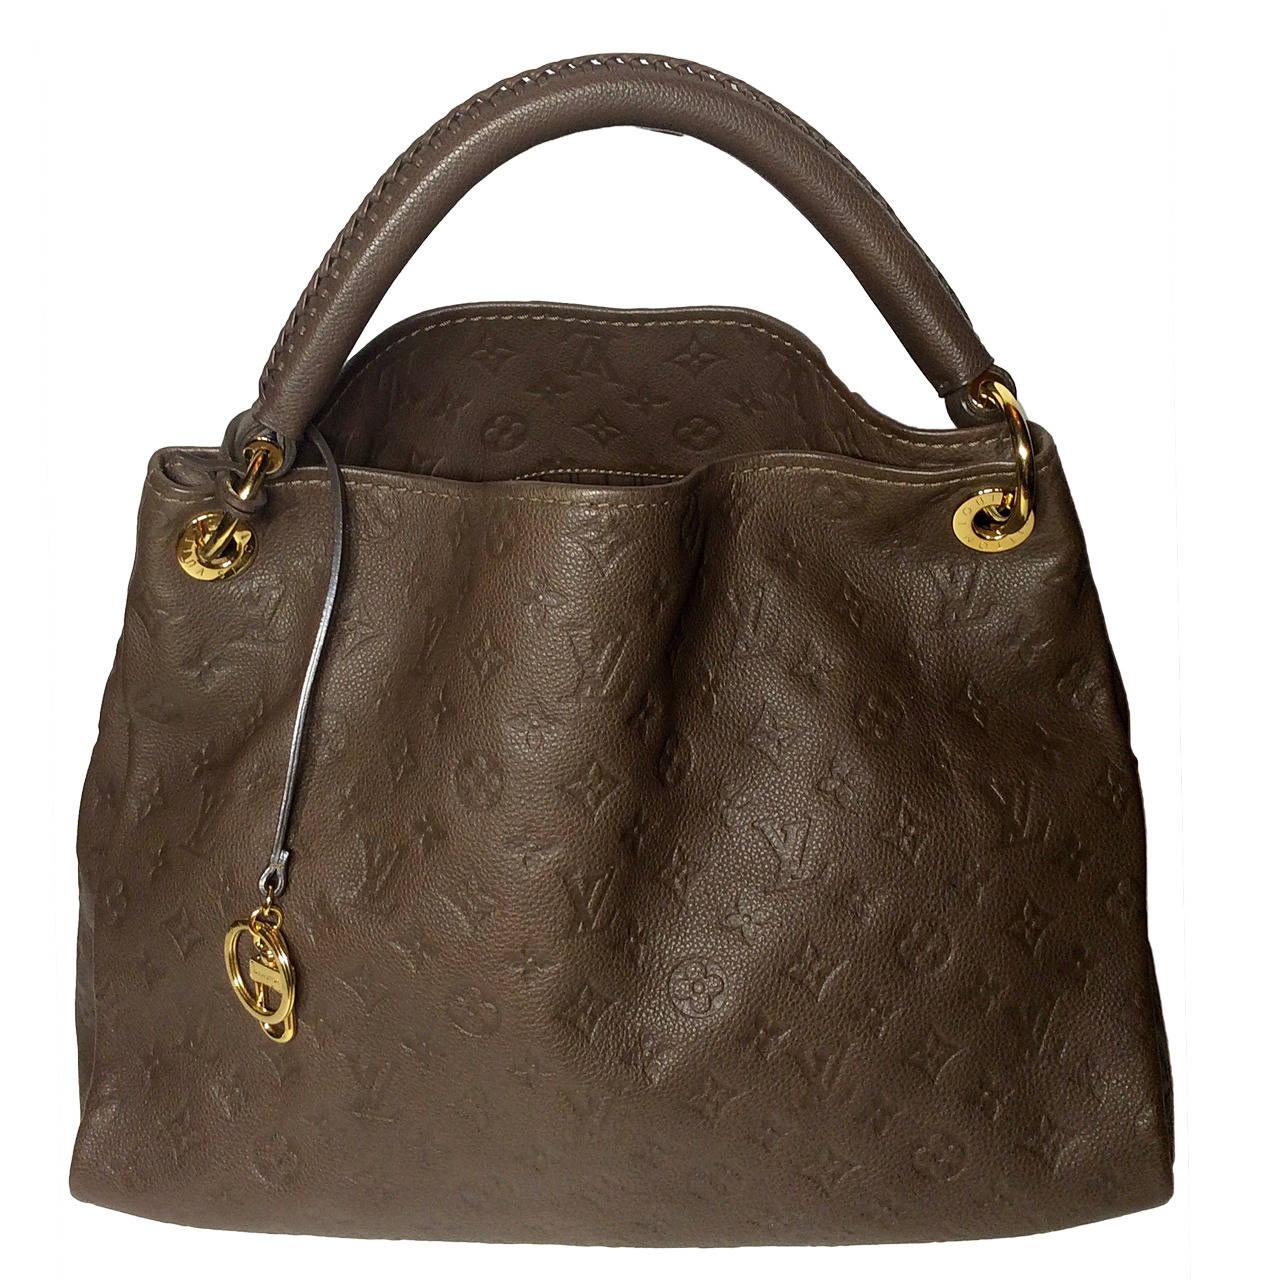 Louis Vuitton Monogram Empreinte Taupe Artsy Hobo Handbag